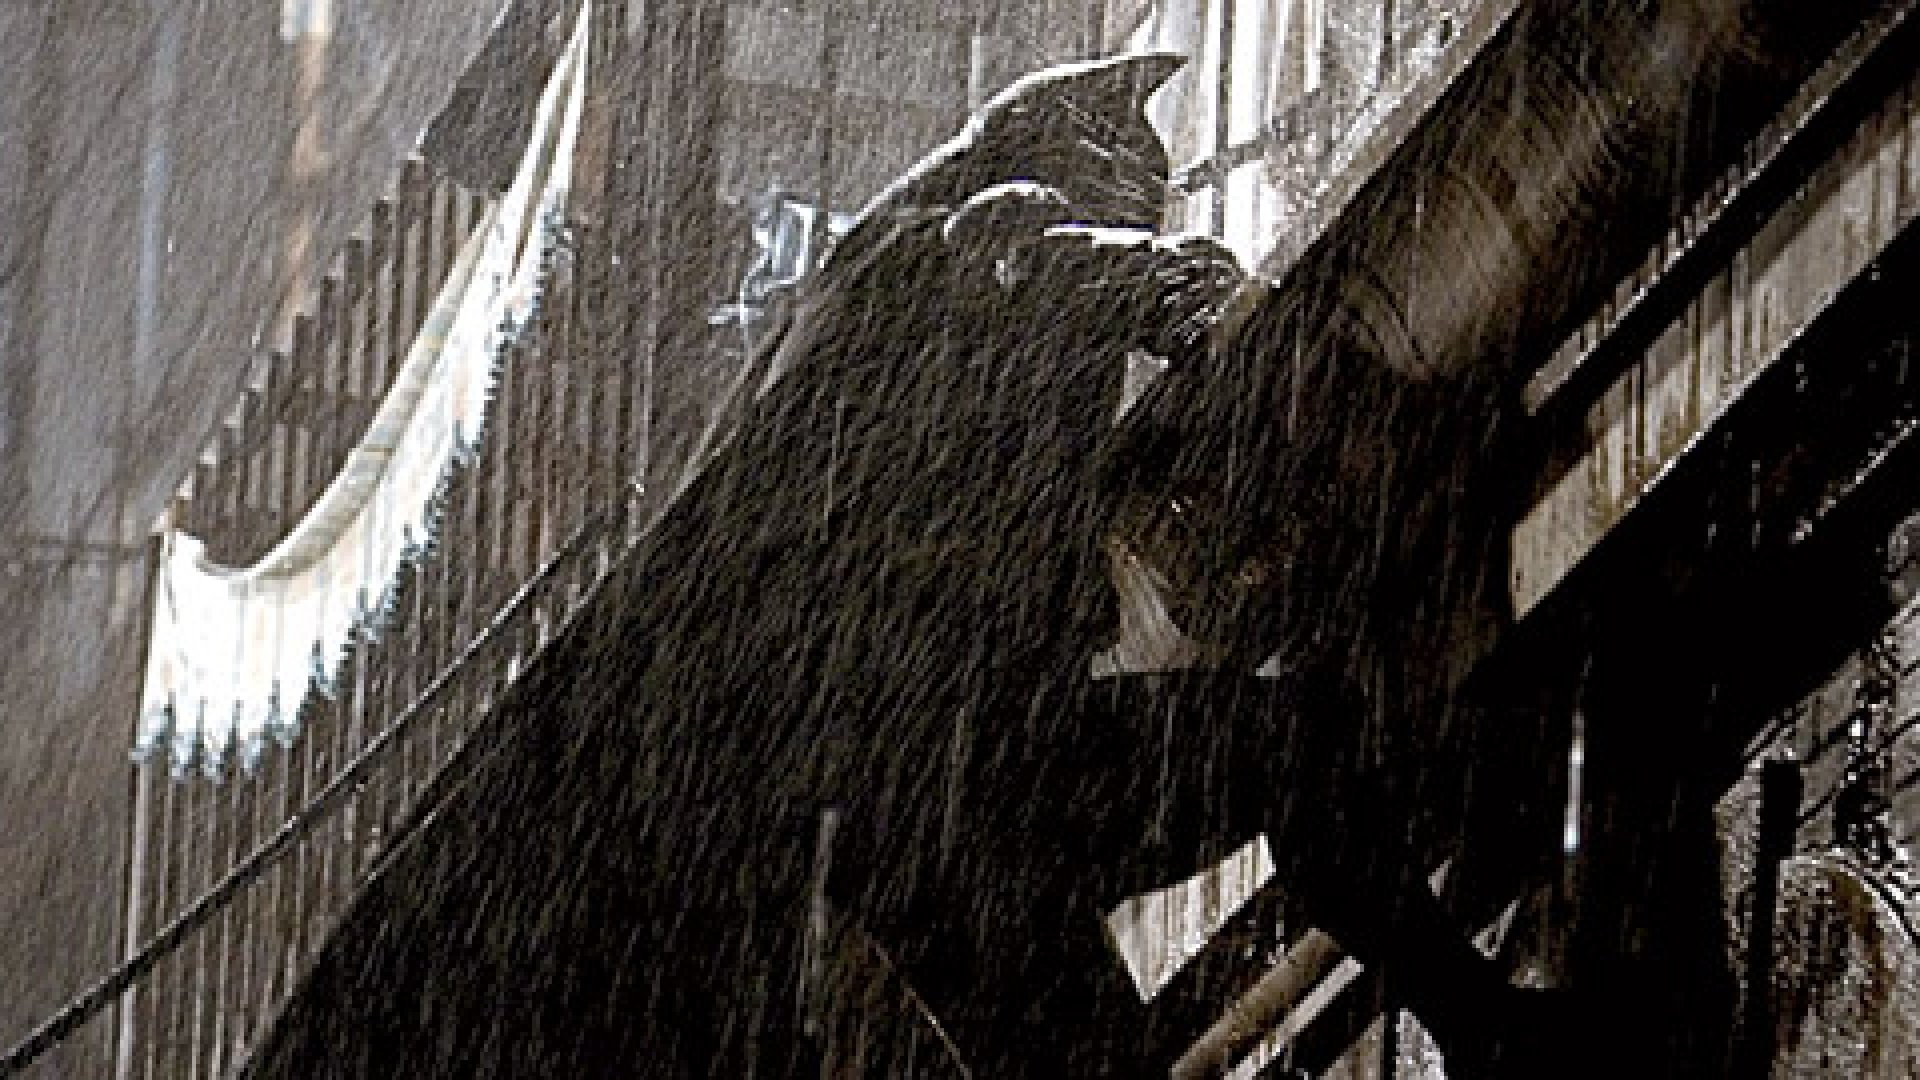 Batman used a grapple gun to scale buildings.